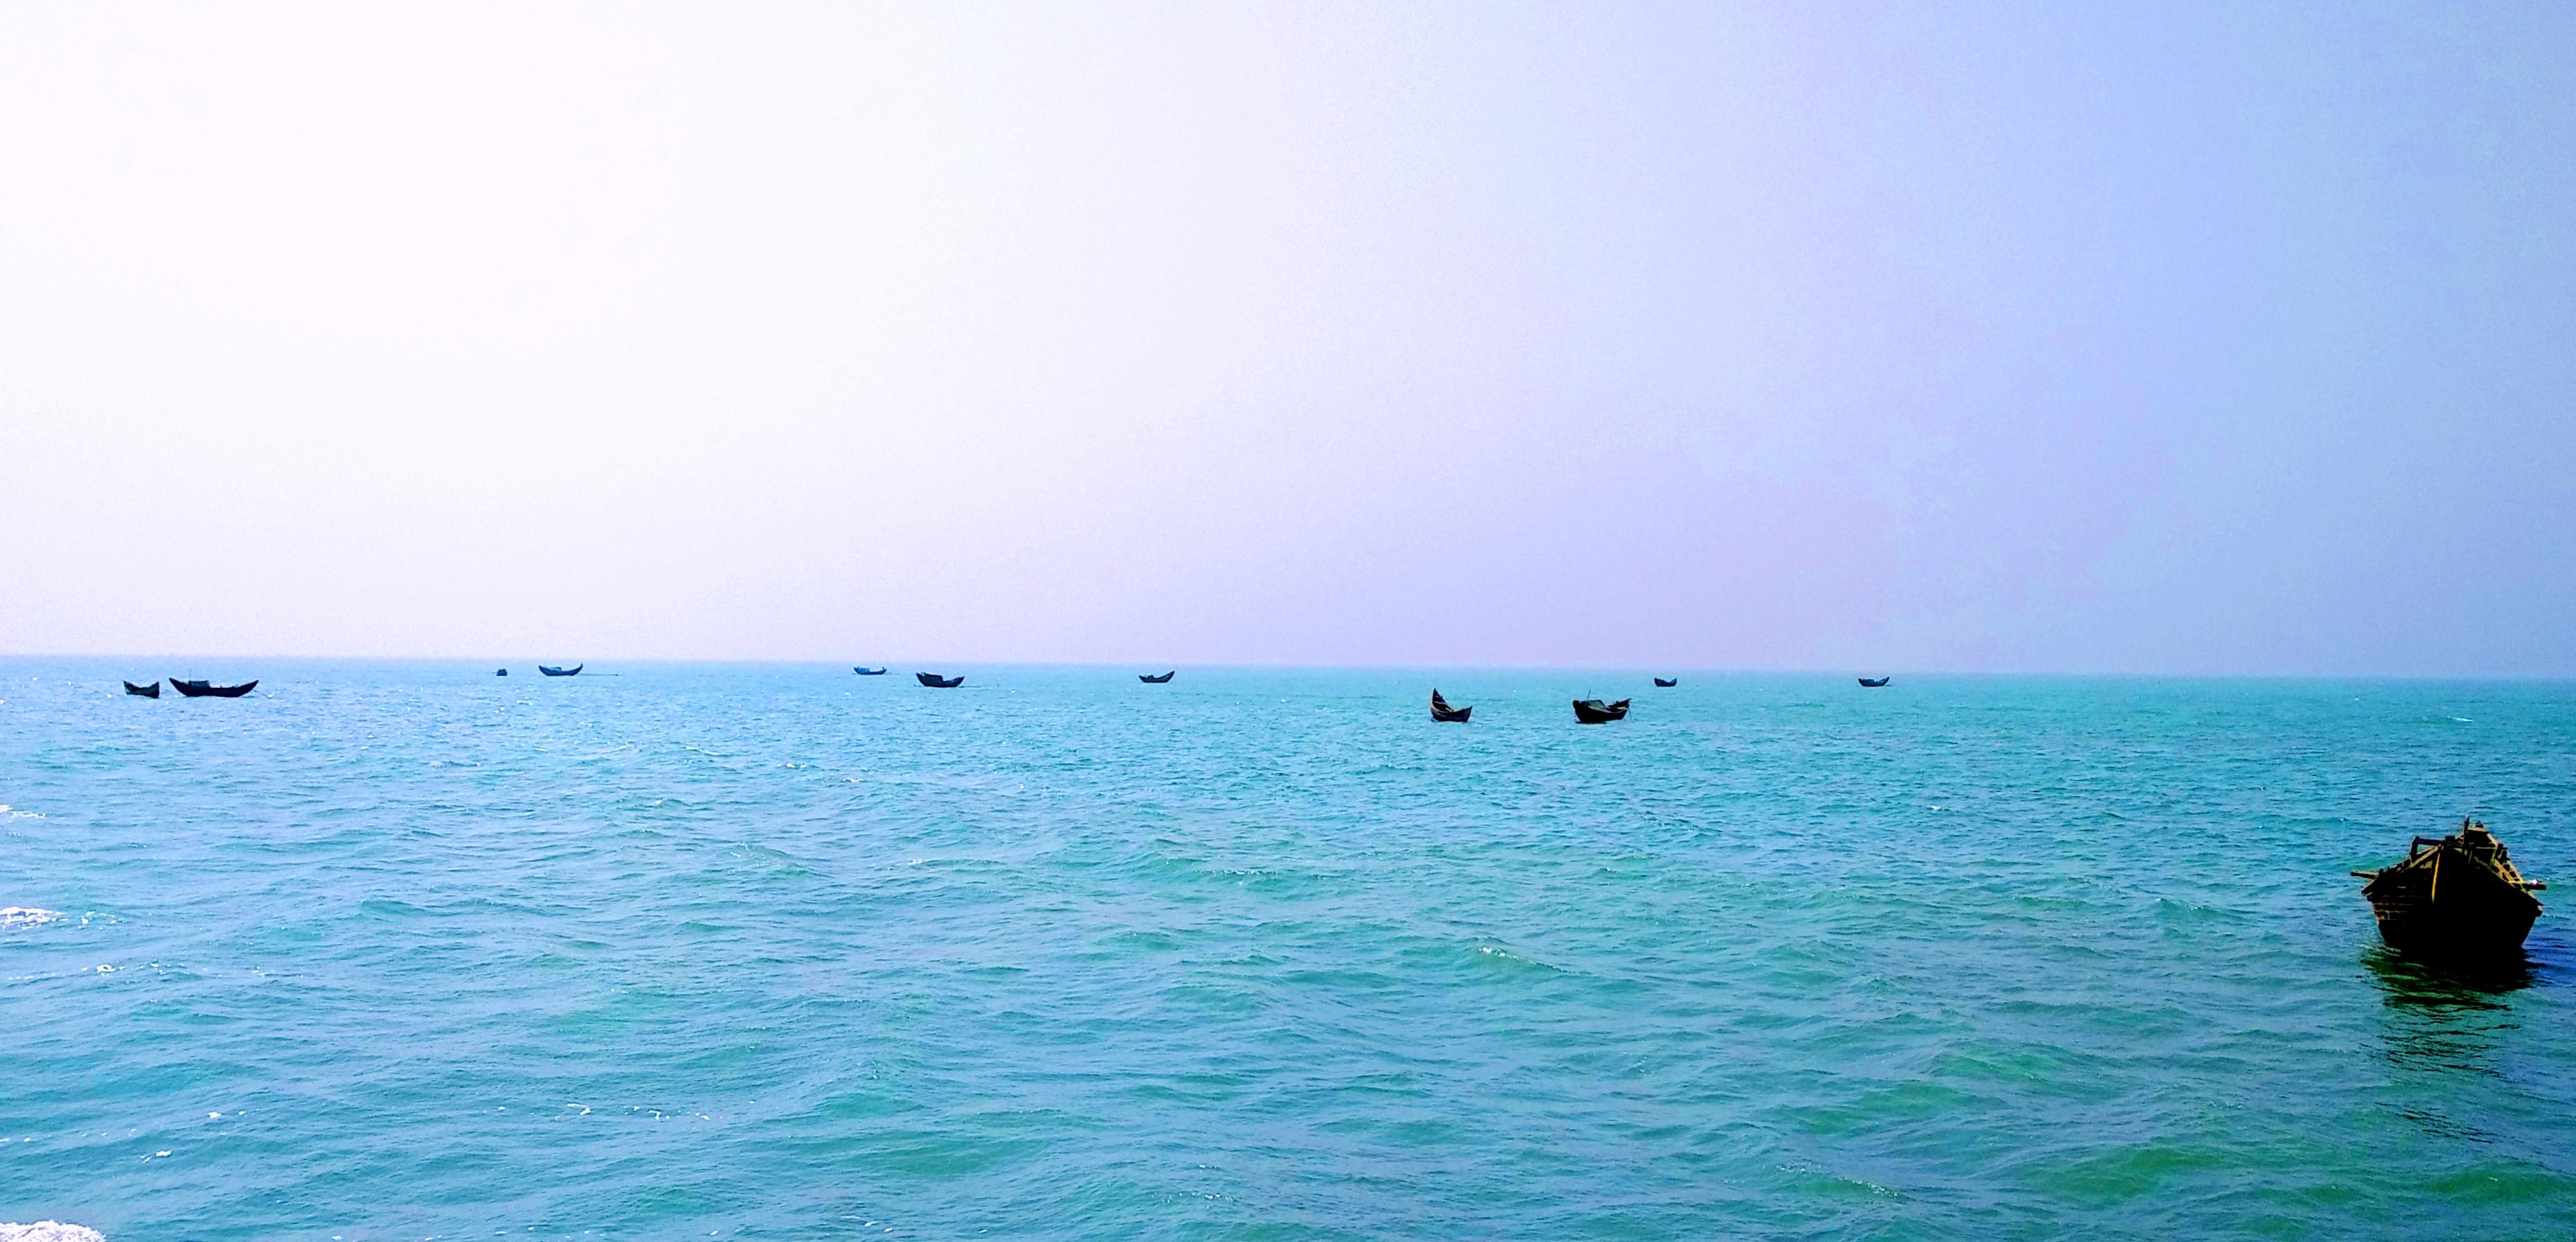 Floating fishing boat in naf river photo